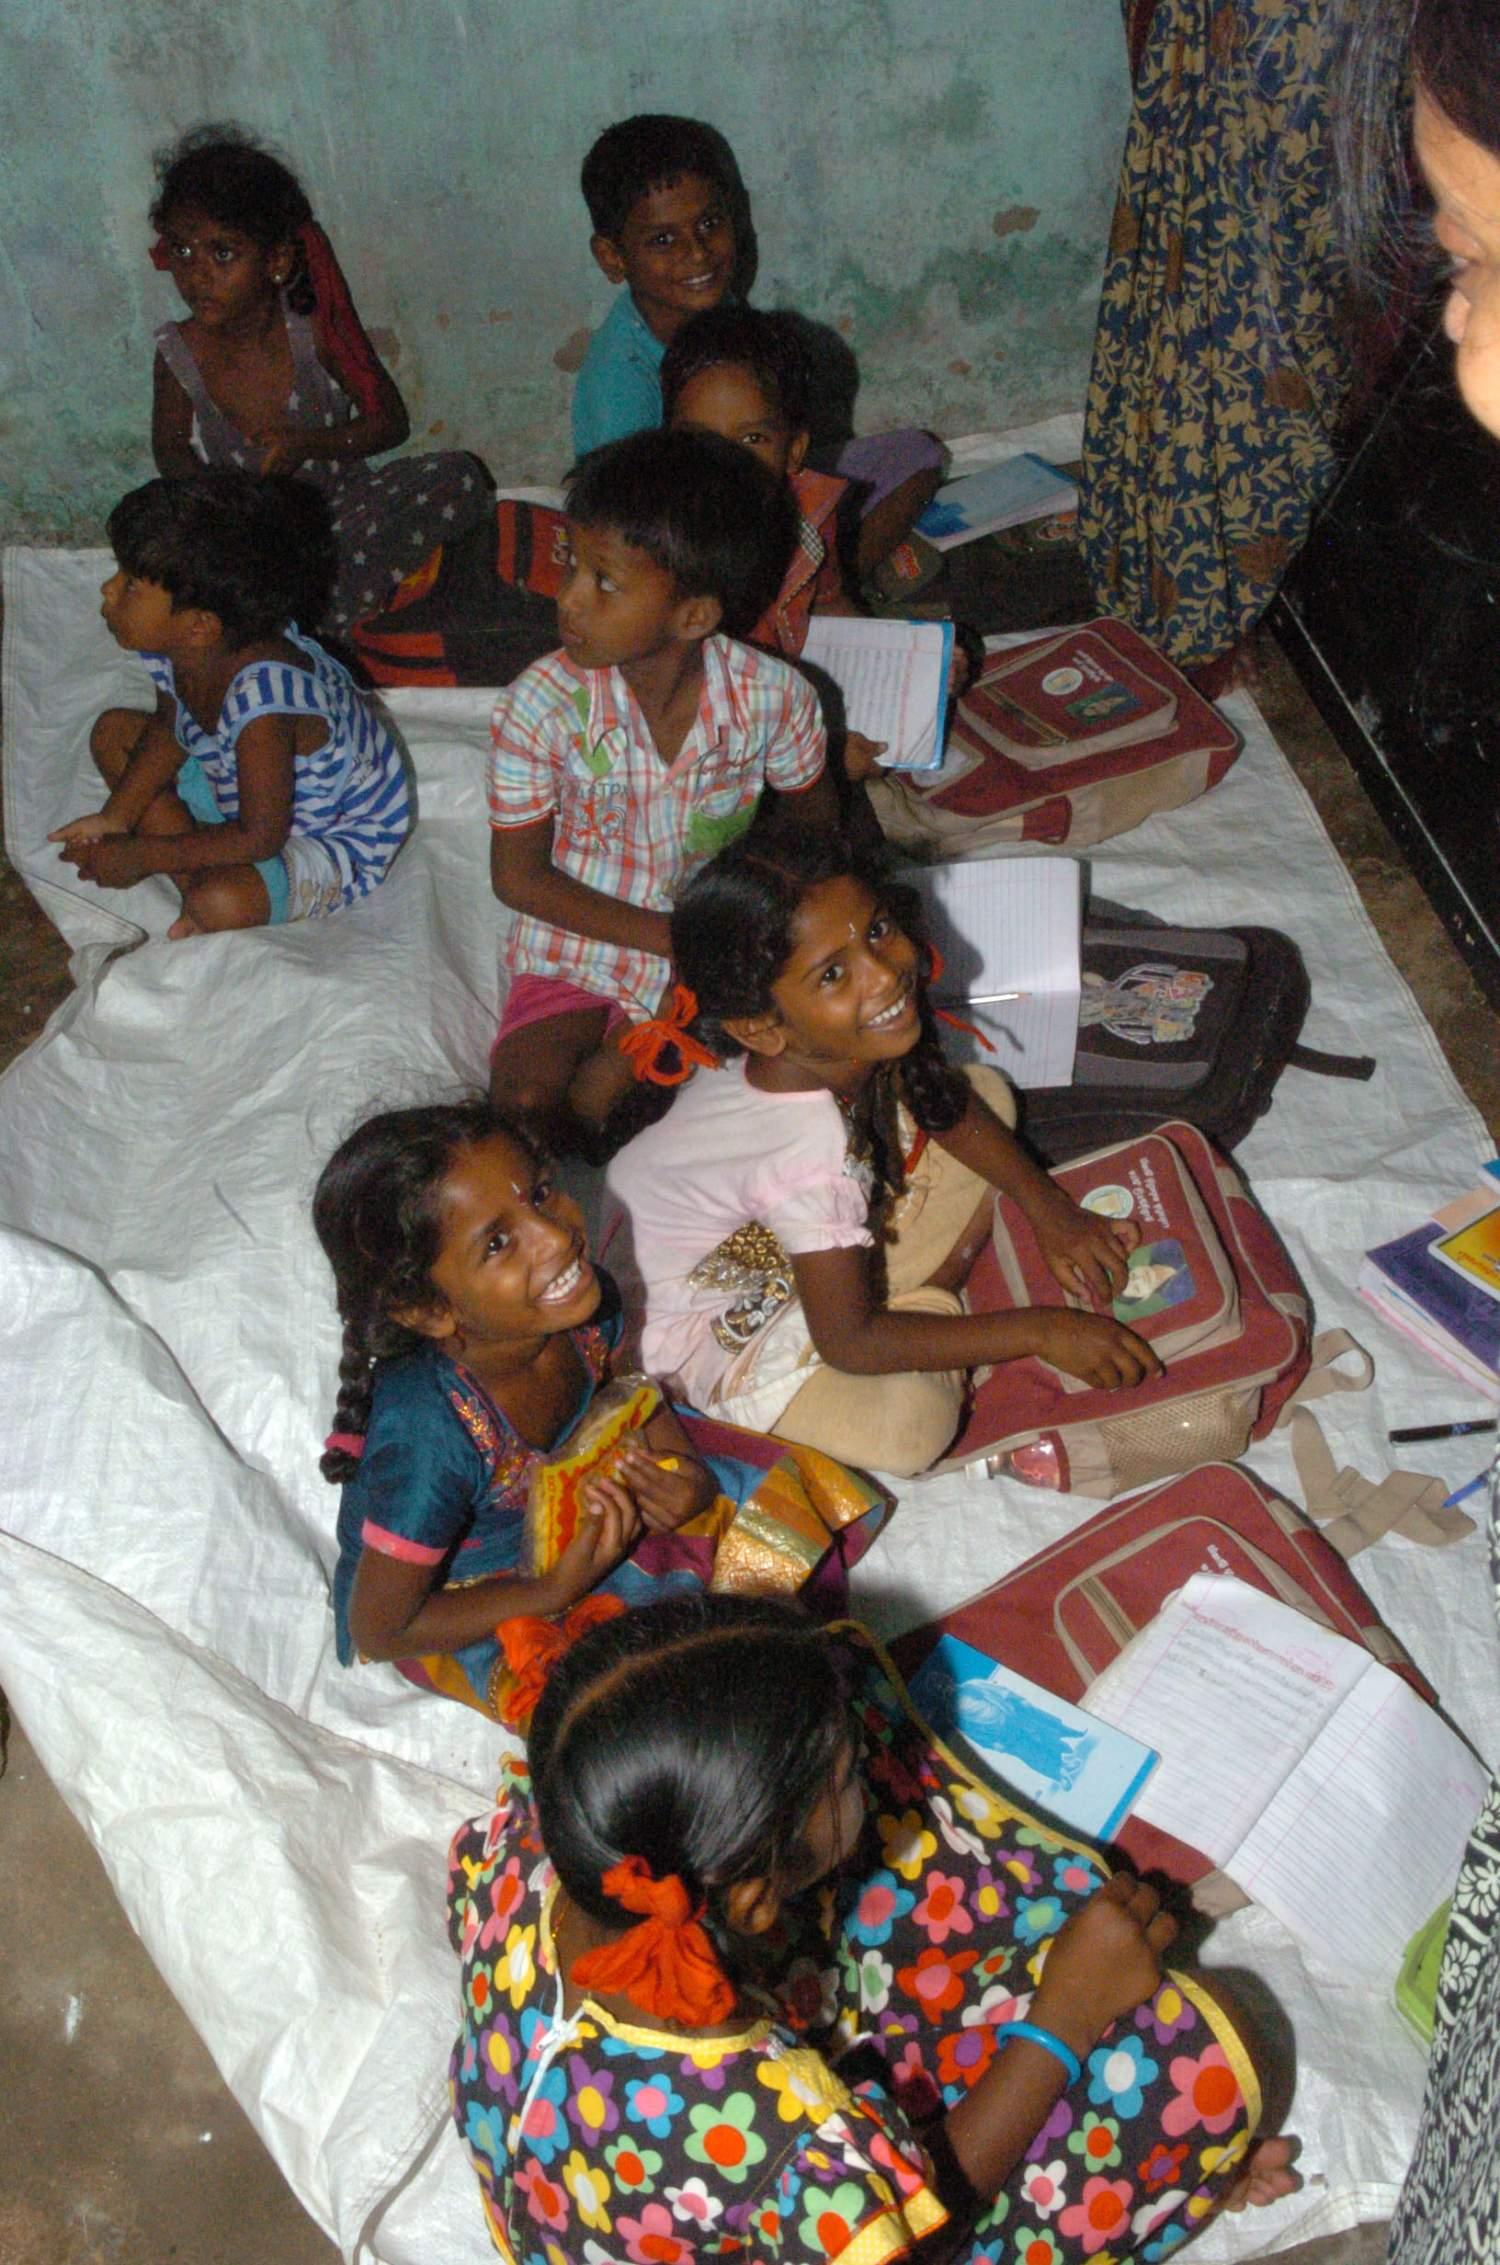 Intia-girls__1542878379_193.143.48.129.jpg